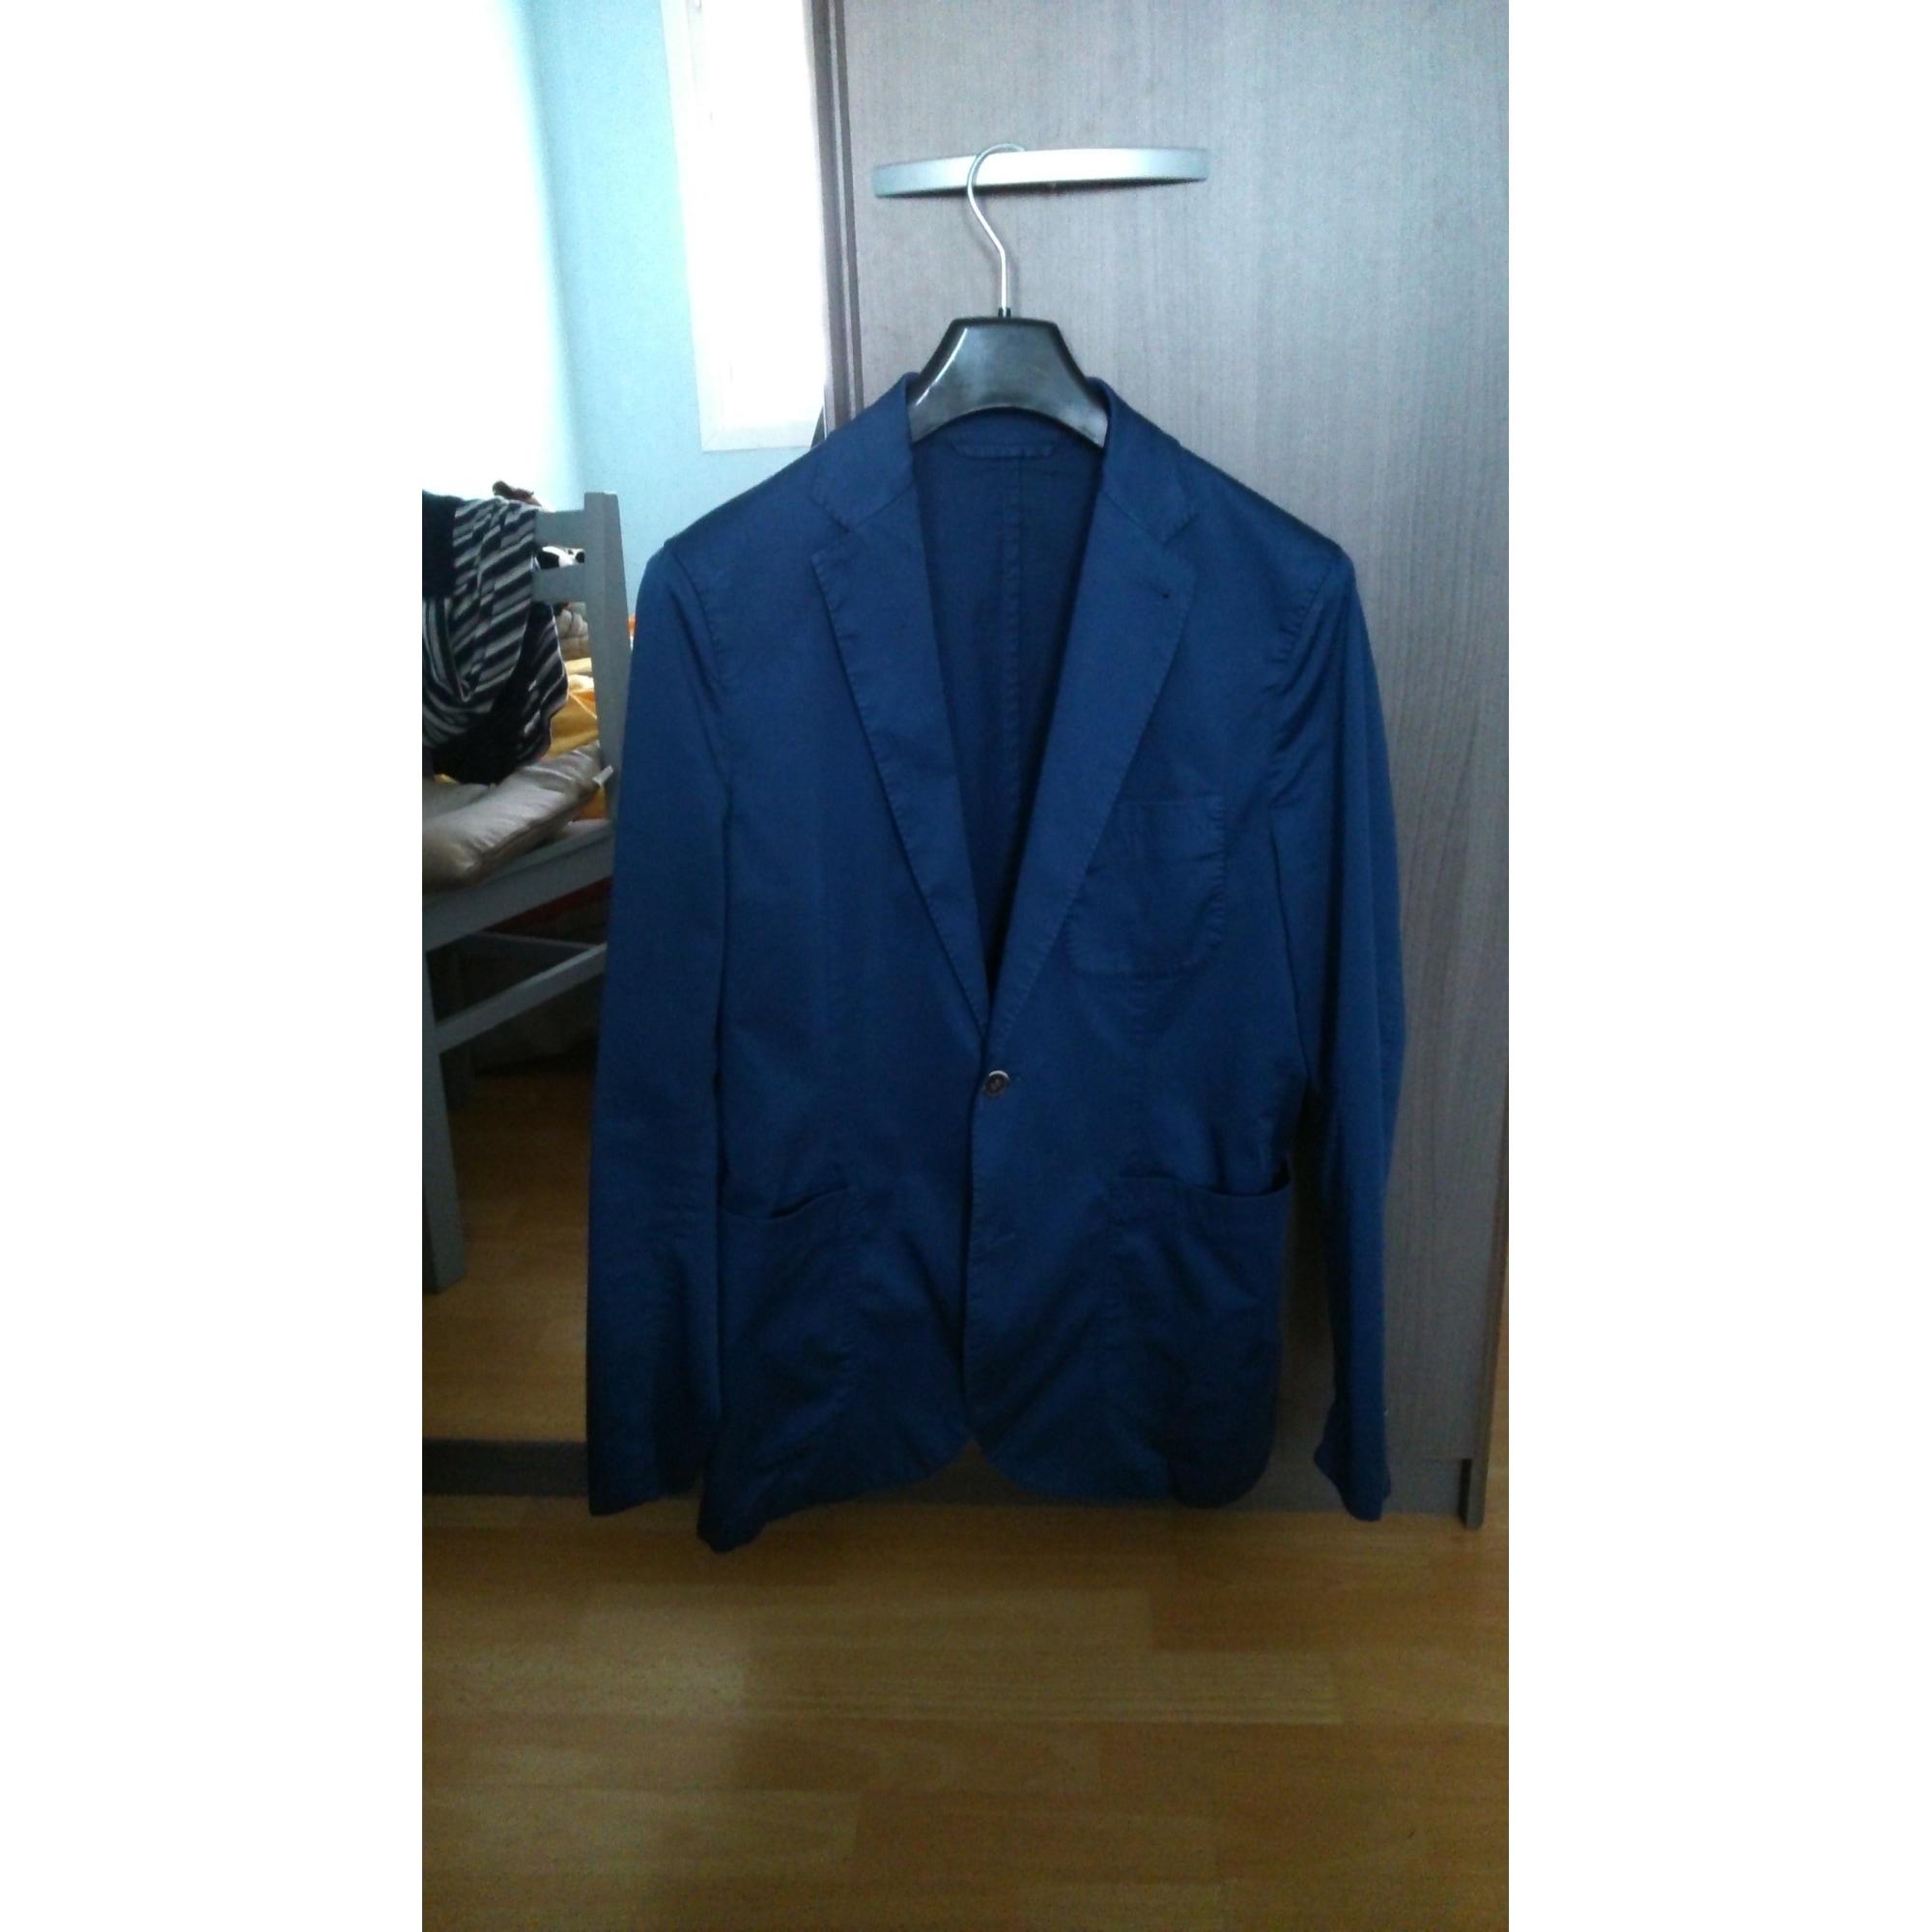 d3a8caab5e5a6b Veste de costume SUITSUPPLY Bleu, bleu marine, bleu turquoise